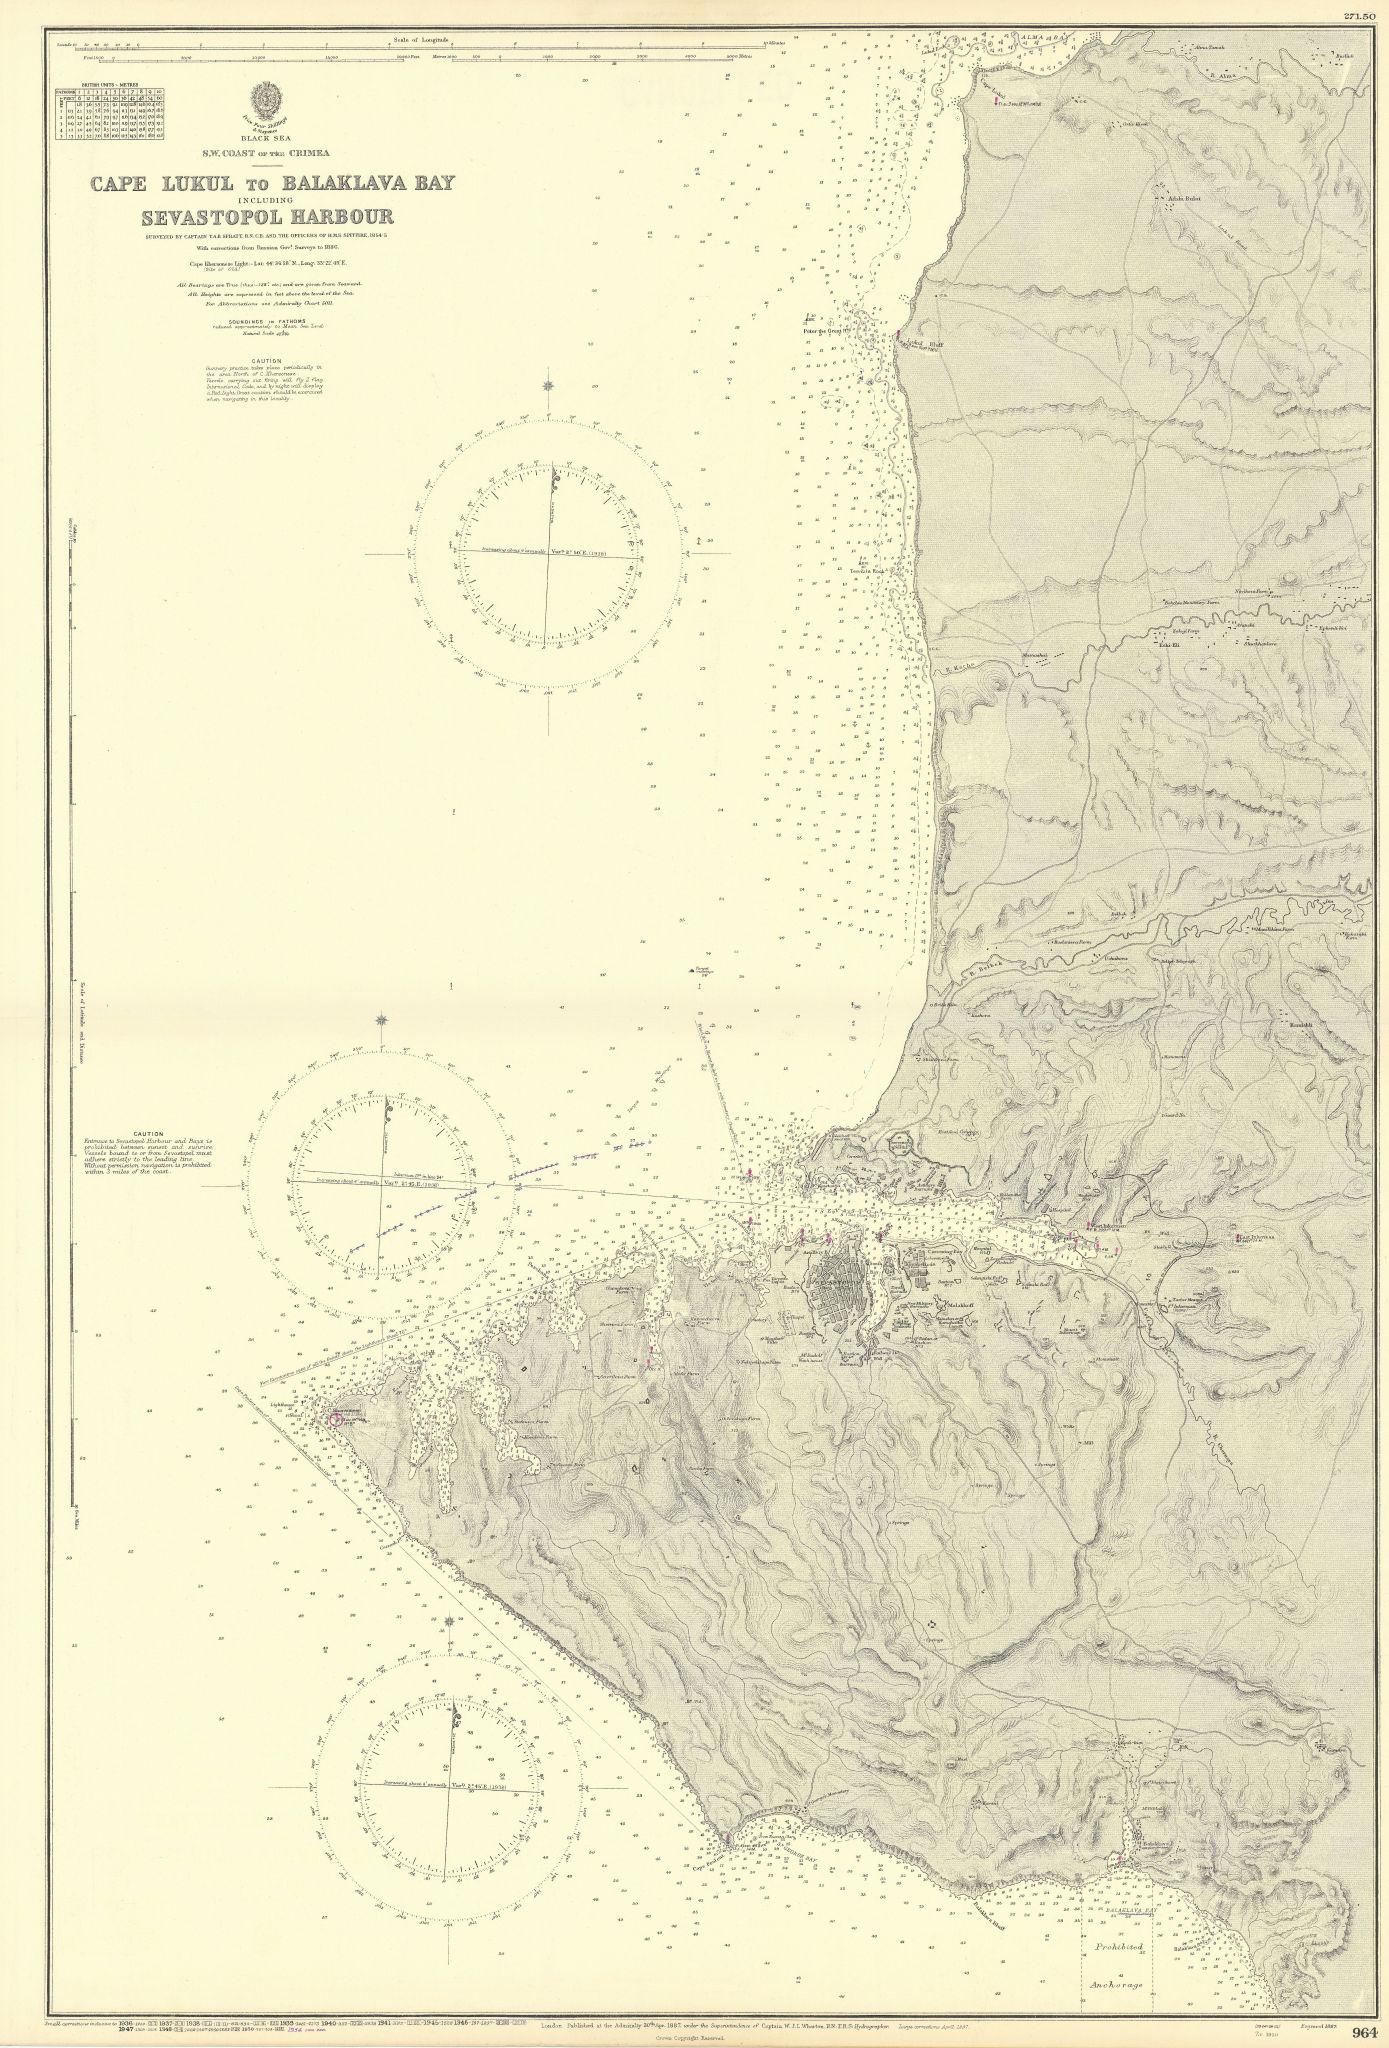 Crimea SW coast Balaklava Bay Sevastopol Harbour ADMIRALTY chart 1887 (1954) map